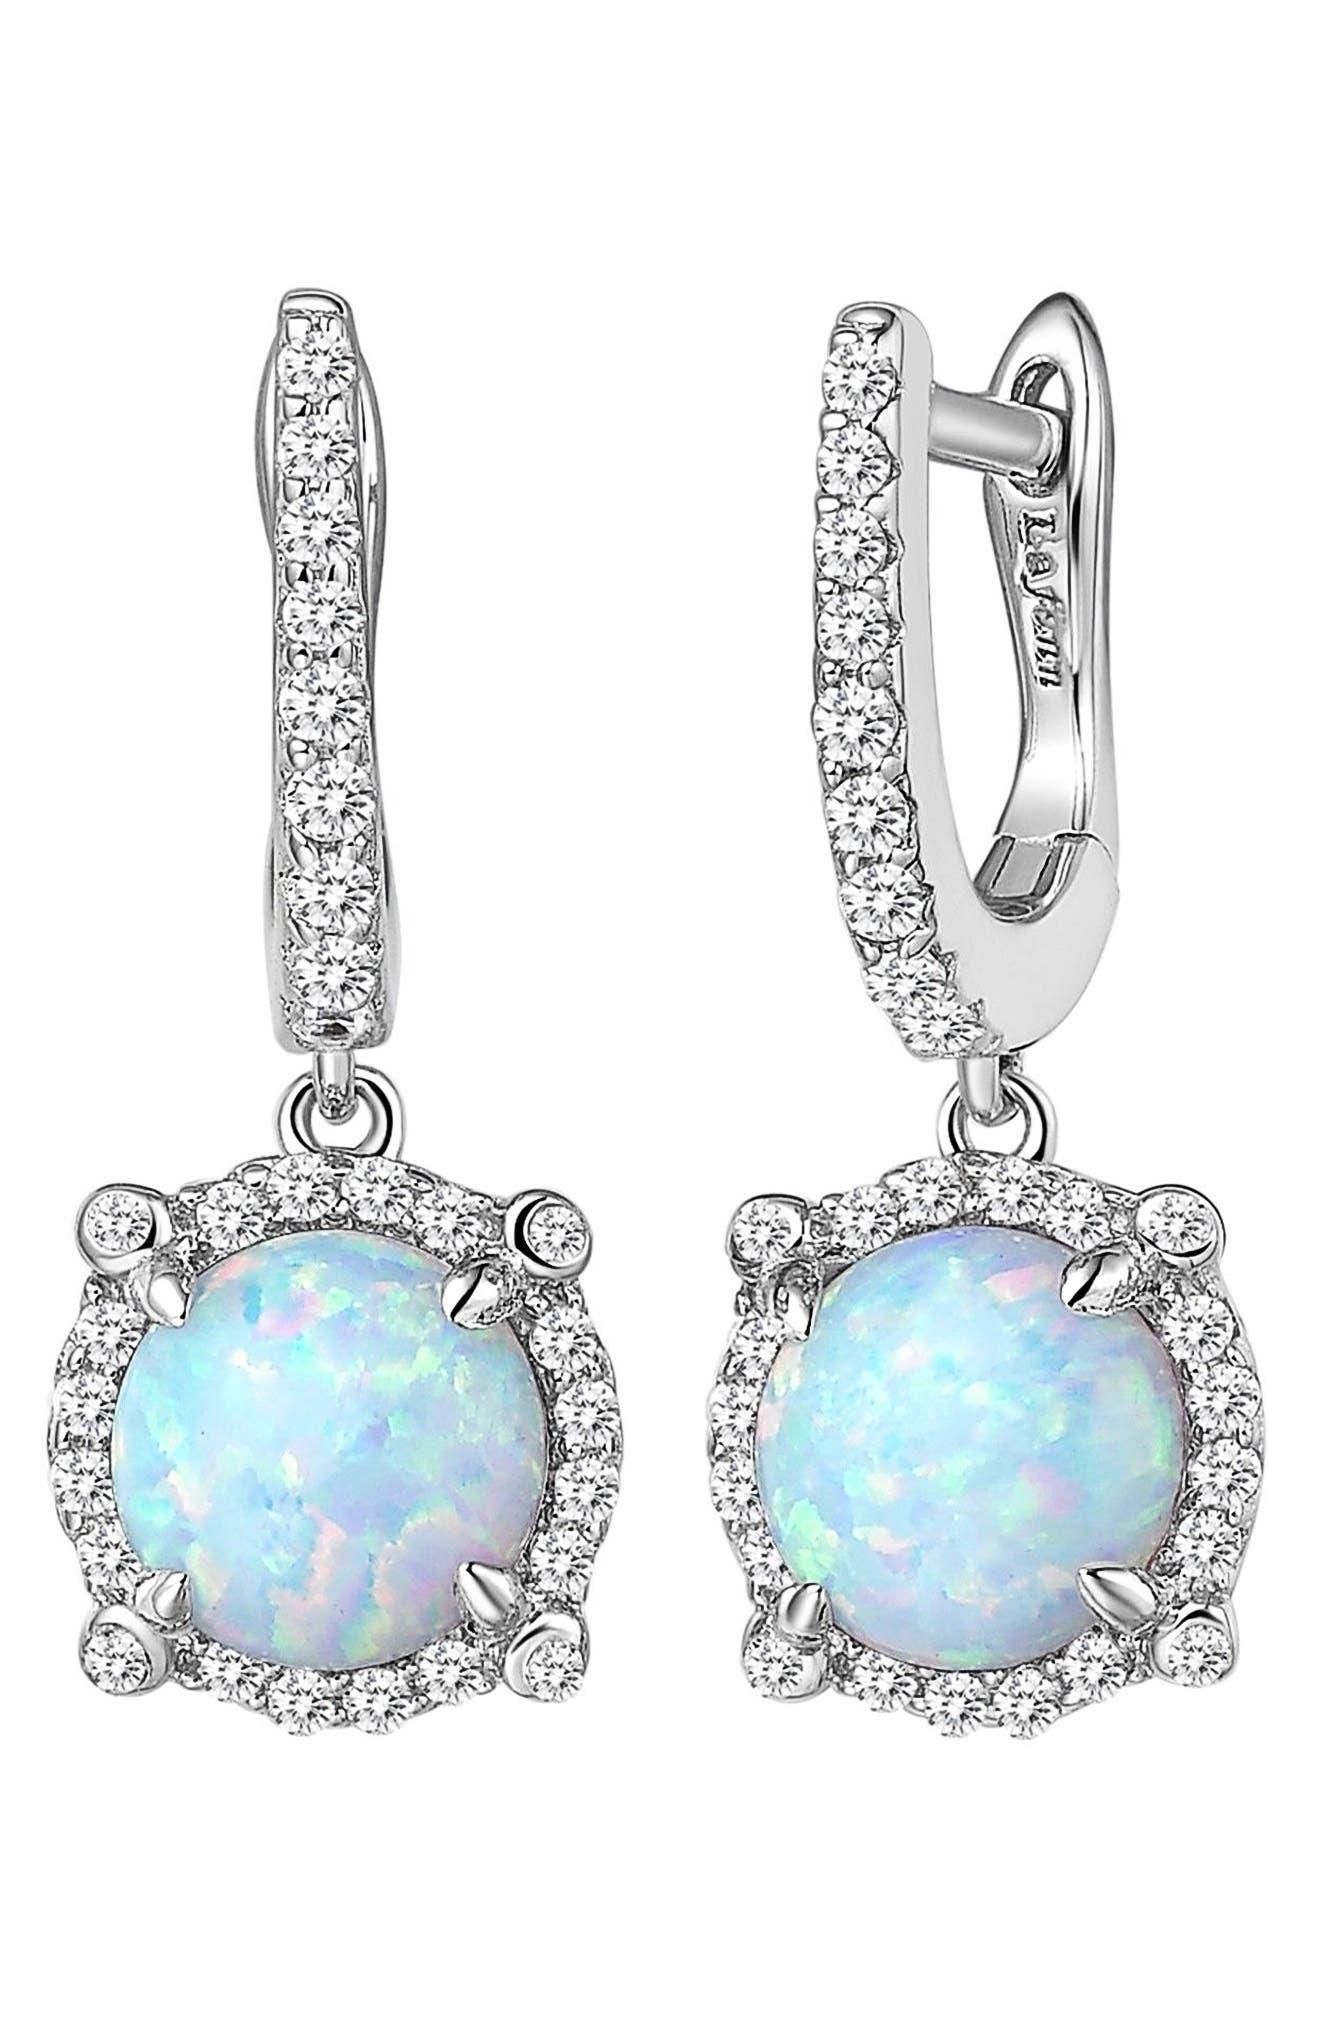 Simulated Diamond Drop Earrings,                             Alternate thumbnail 3, color,                             SILVER/ OPAL/ CLEAR